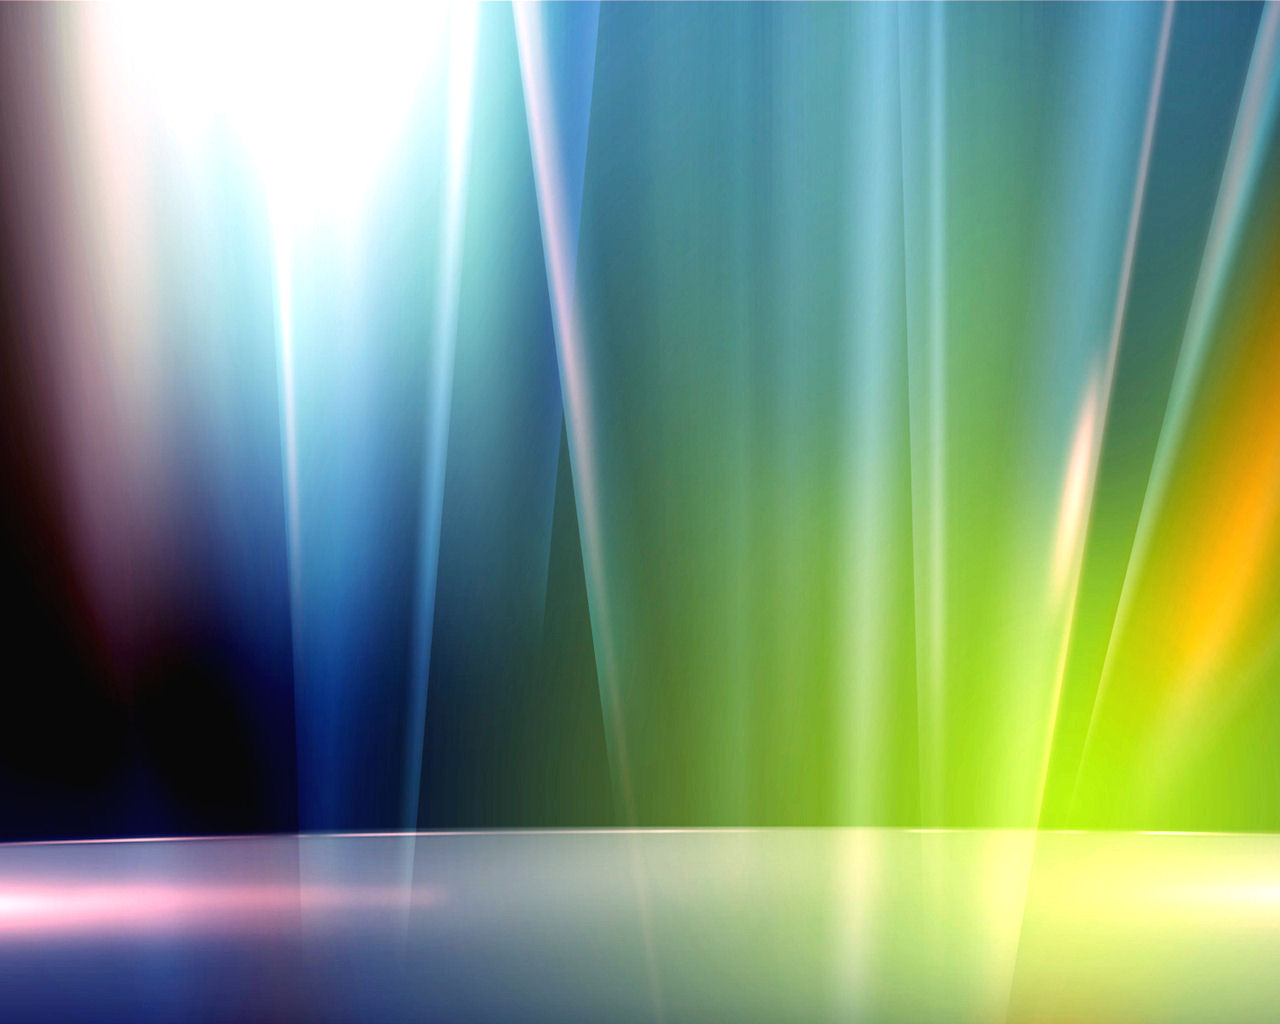 http://4.bp.blogspot.com/-tthHAN663Vc/UN-aWBbaVpI/AAAAAAAAB5Q/ES_UAFbmdEc/s1600/dark_vista_aurora.jpg